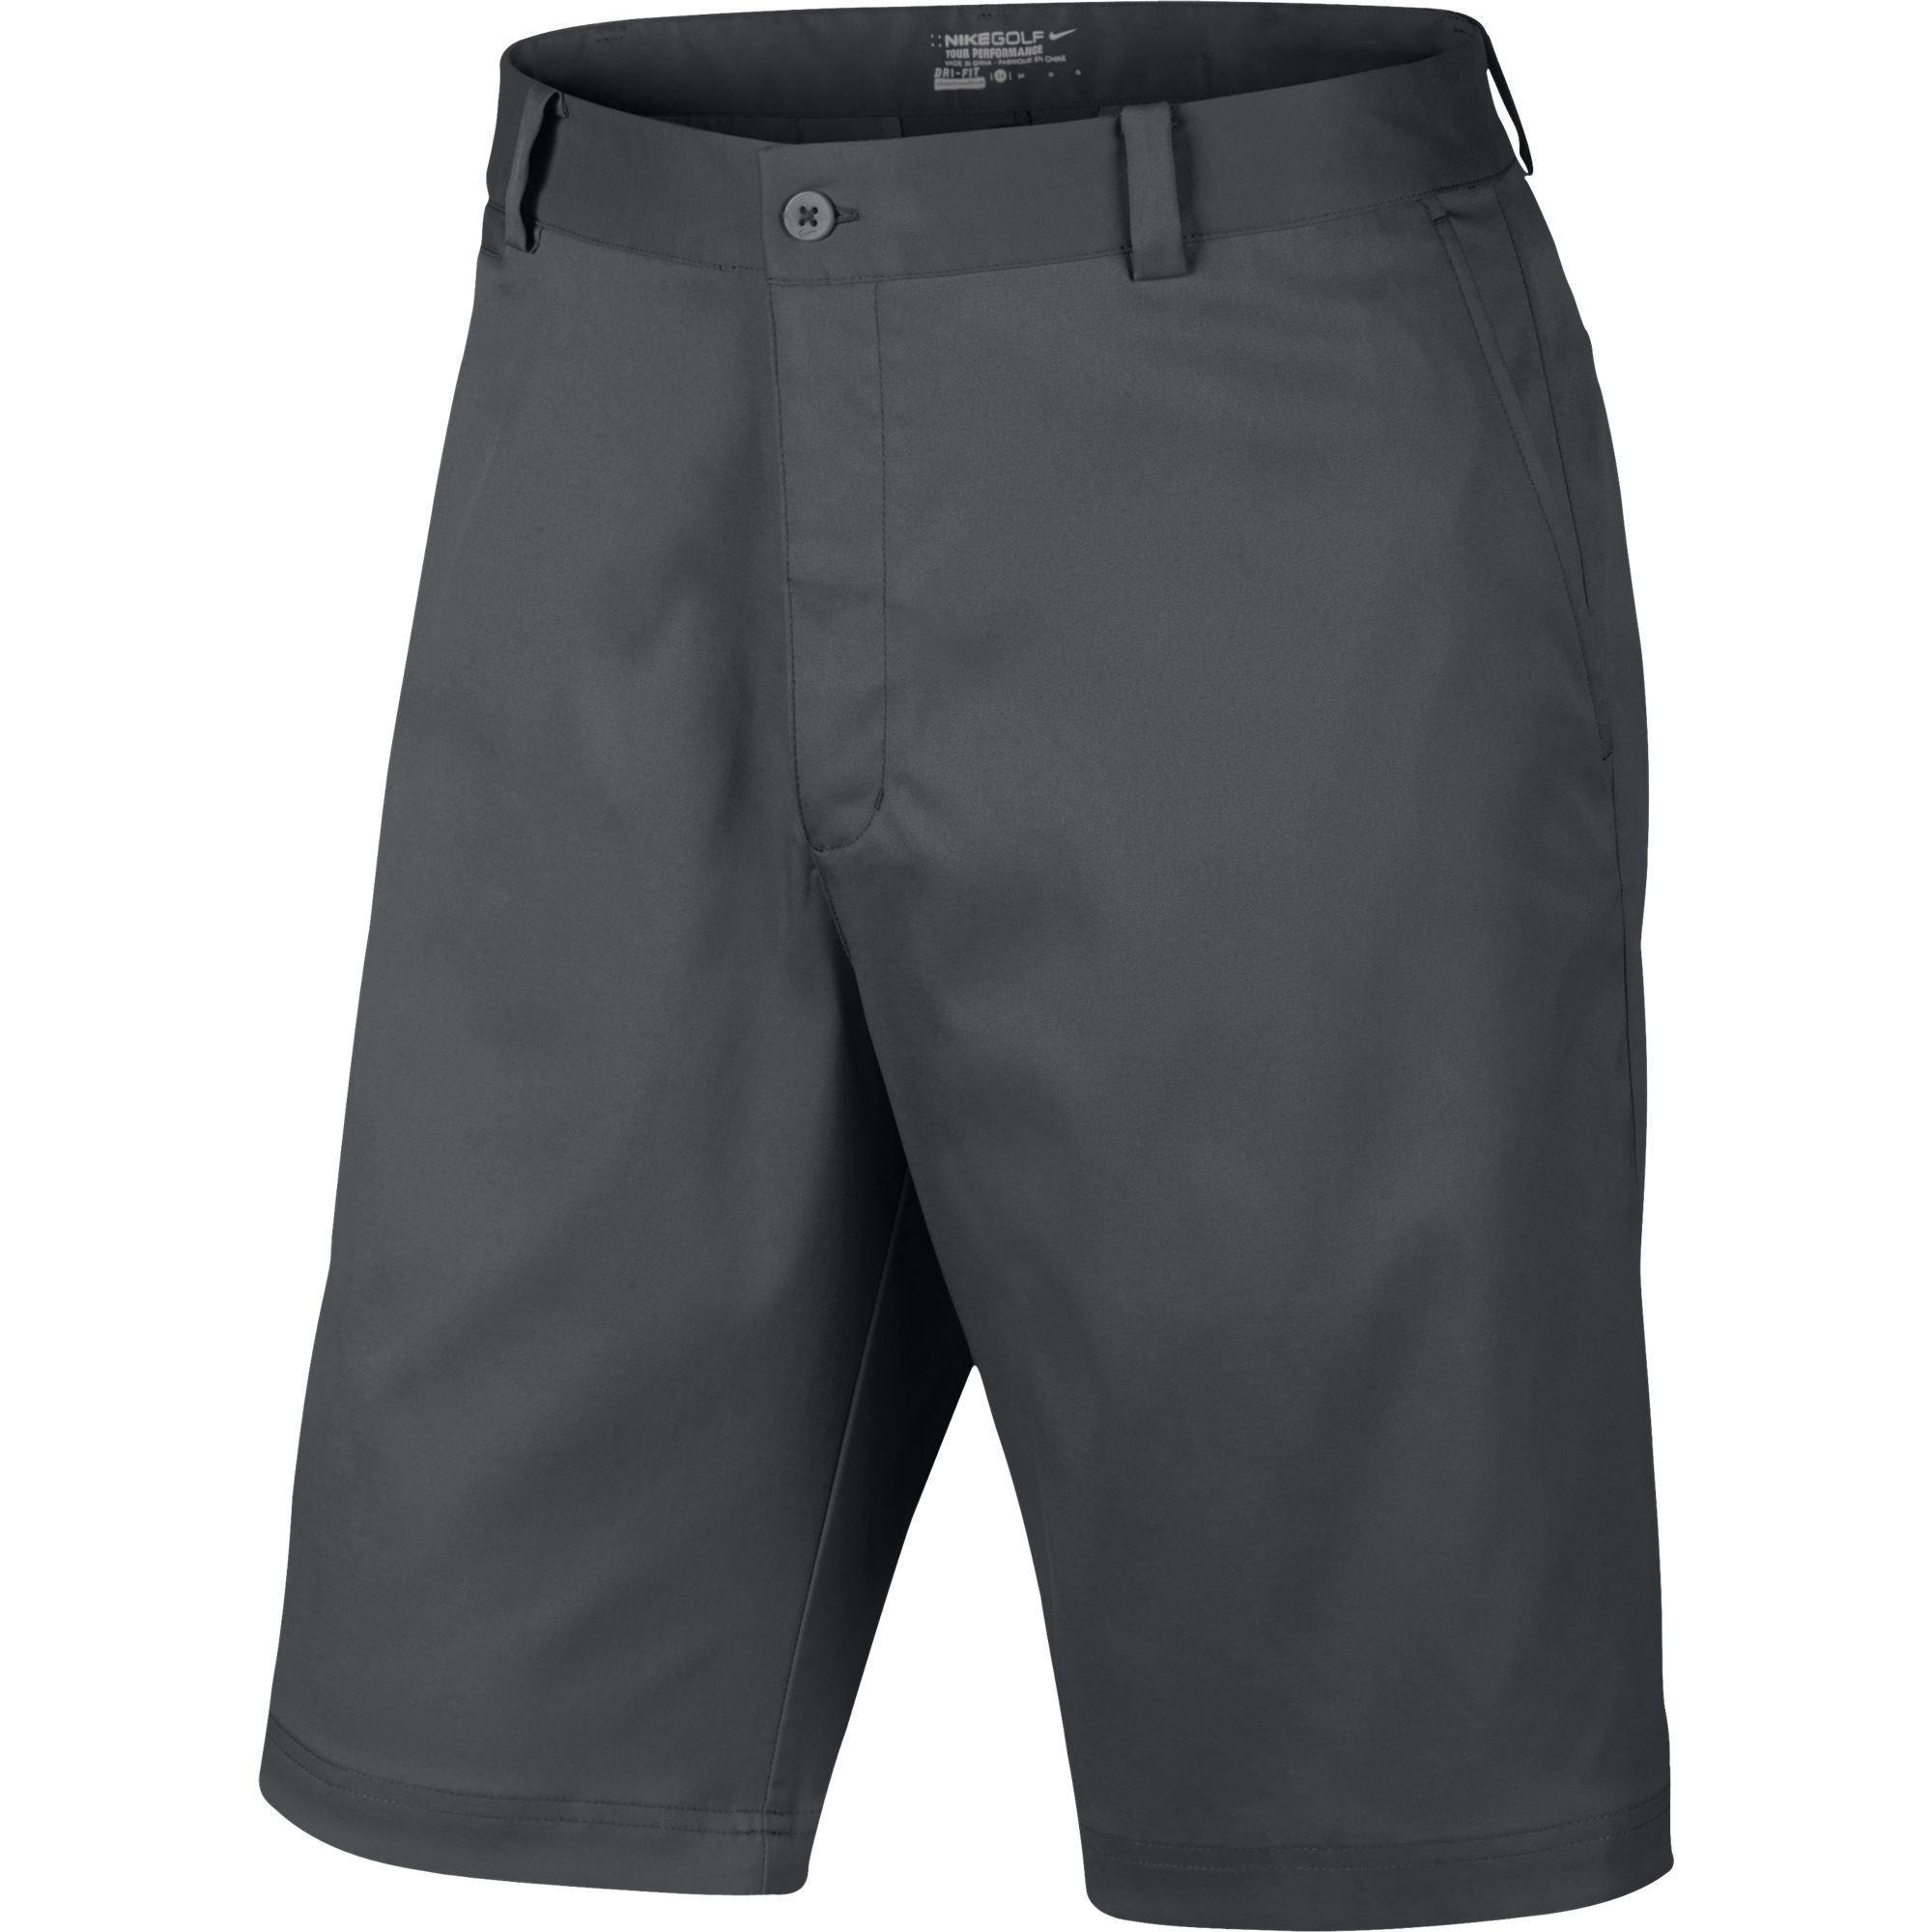 Nike Men's Flat Front Golf Shorts, Dark Grey, 36